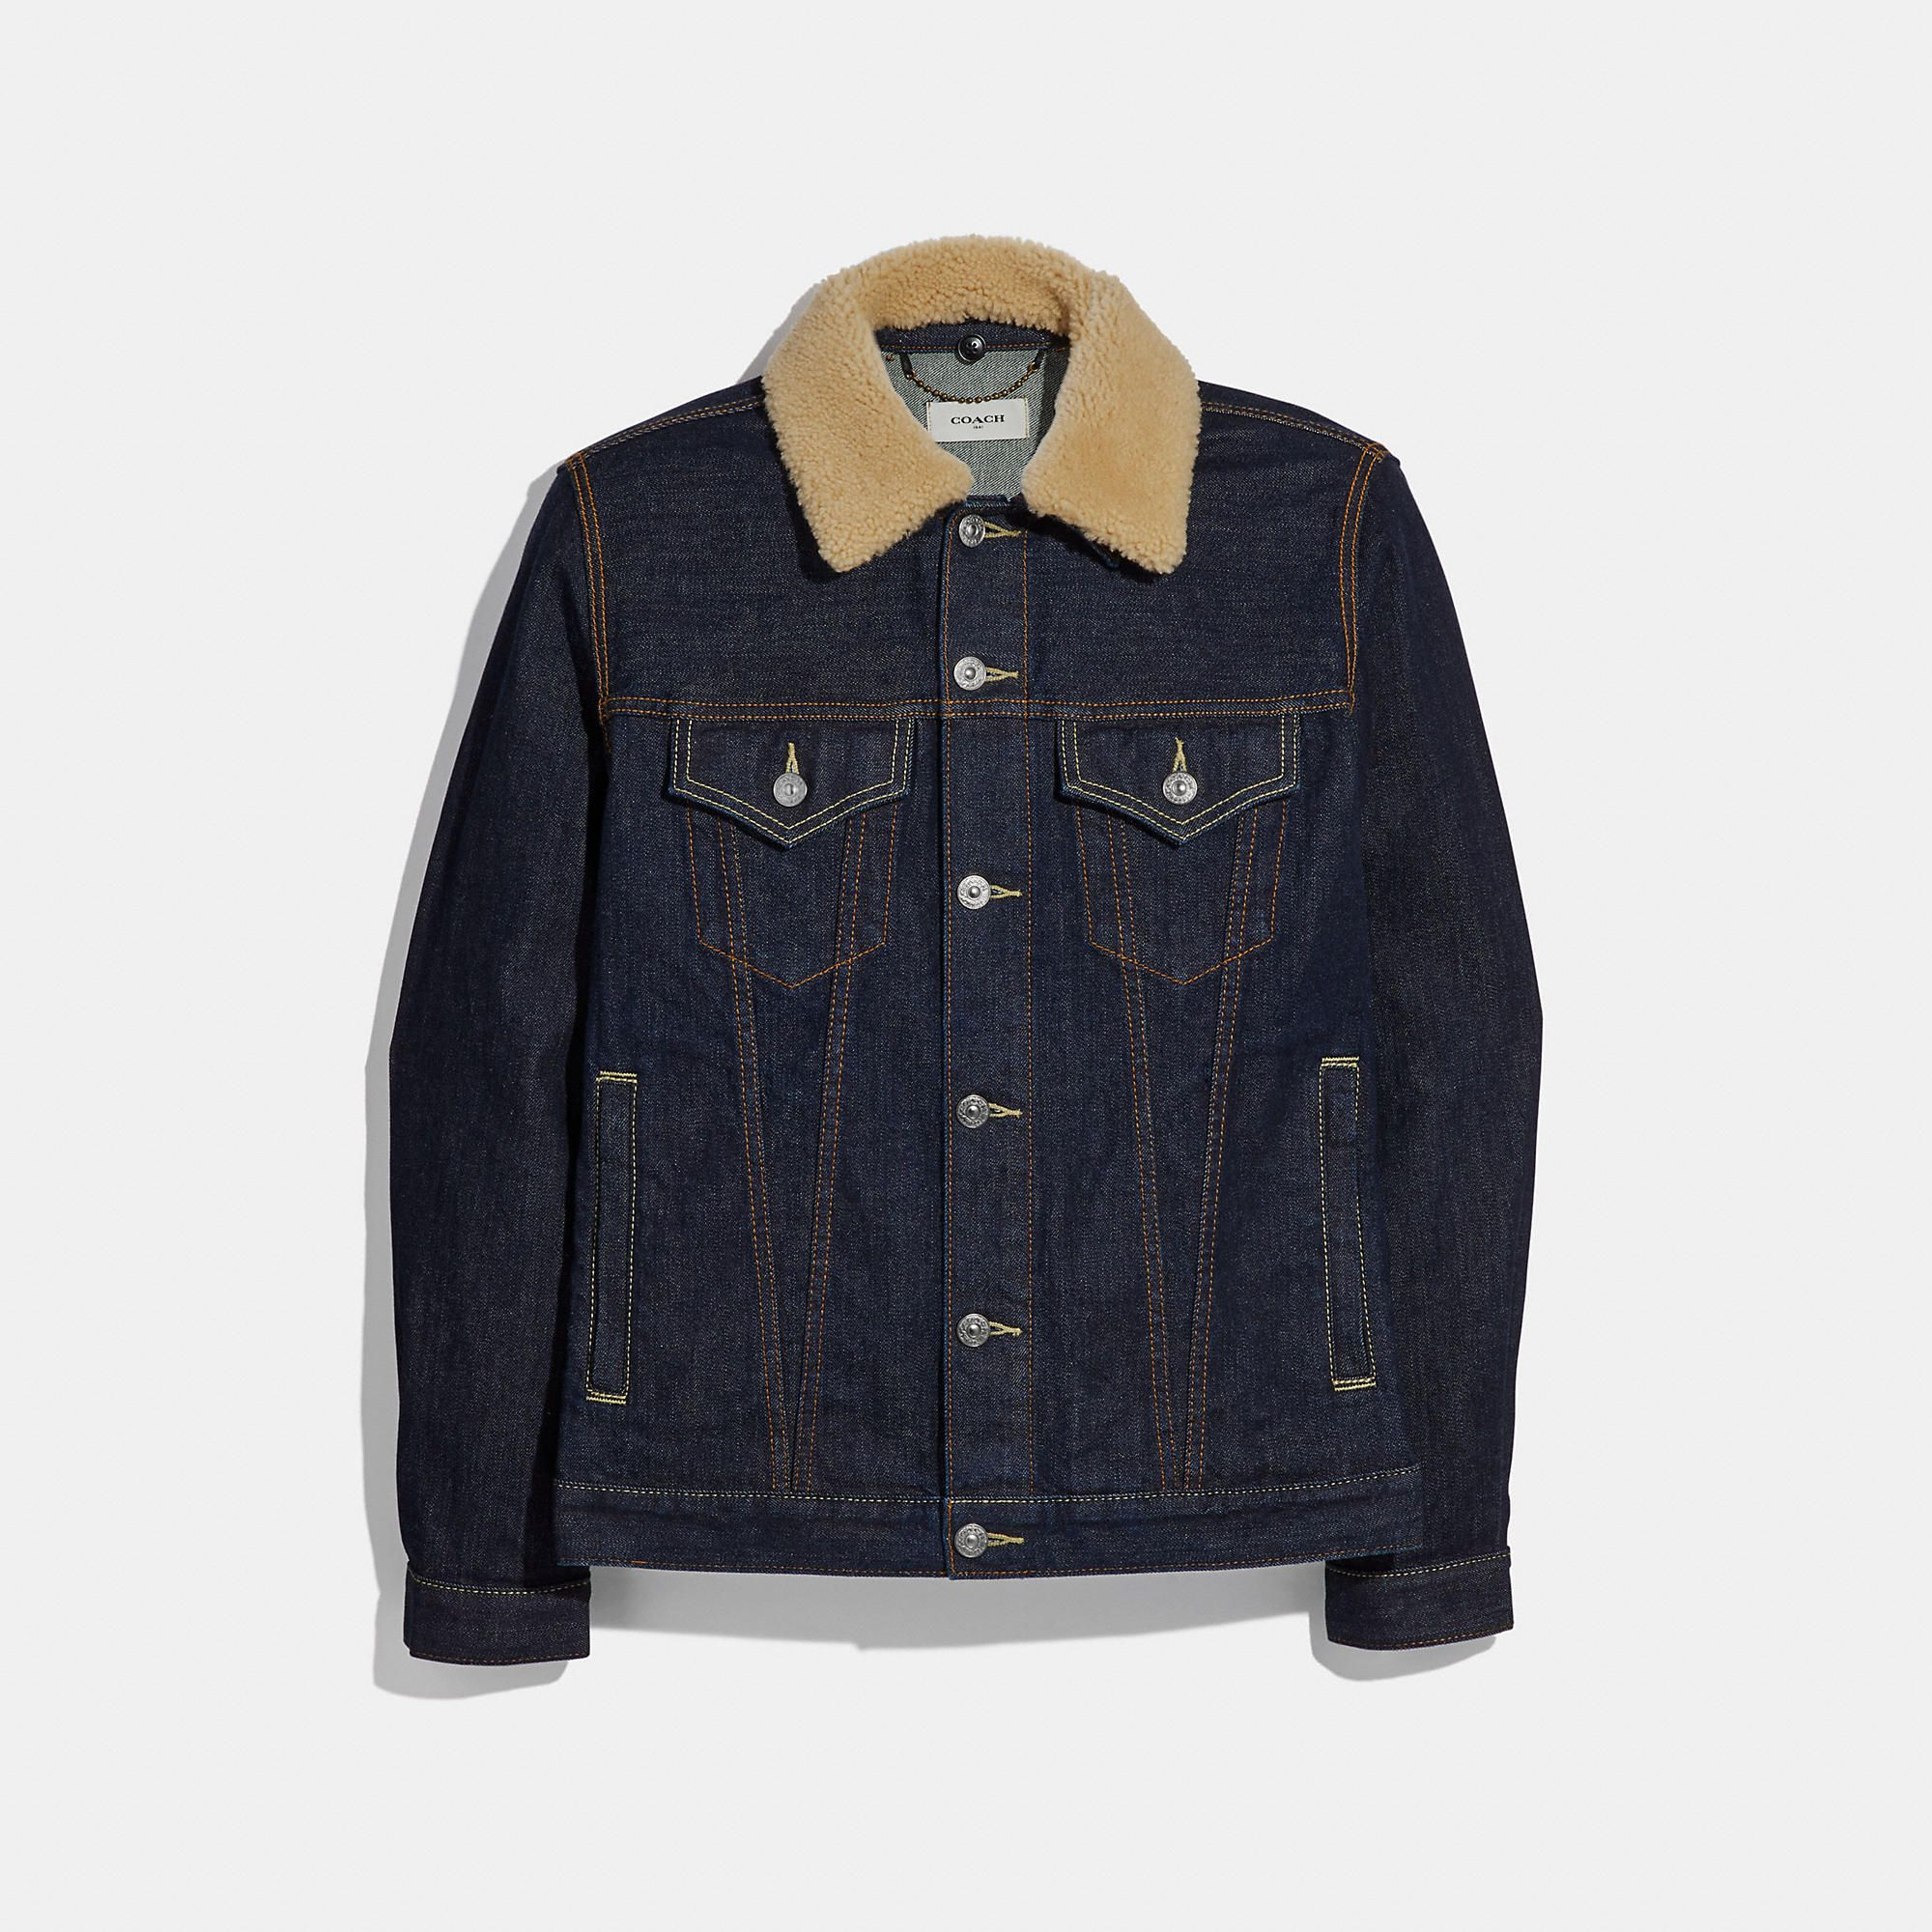 Coach Official Site Designer Handbags Wallets Clothing Menswear Shoes More In 2021 Denim Jacket Denim Jacket Men Shearling Collar [ 2000 x 2000 Pixel ]